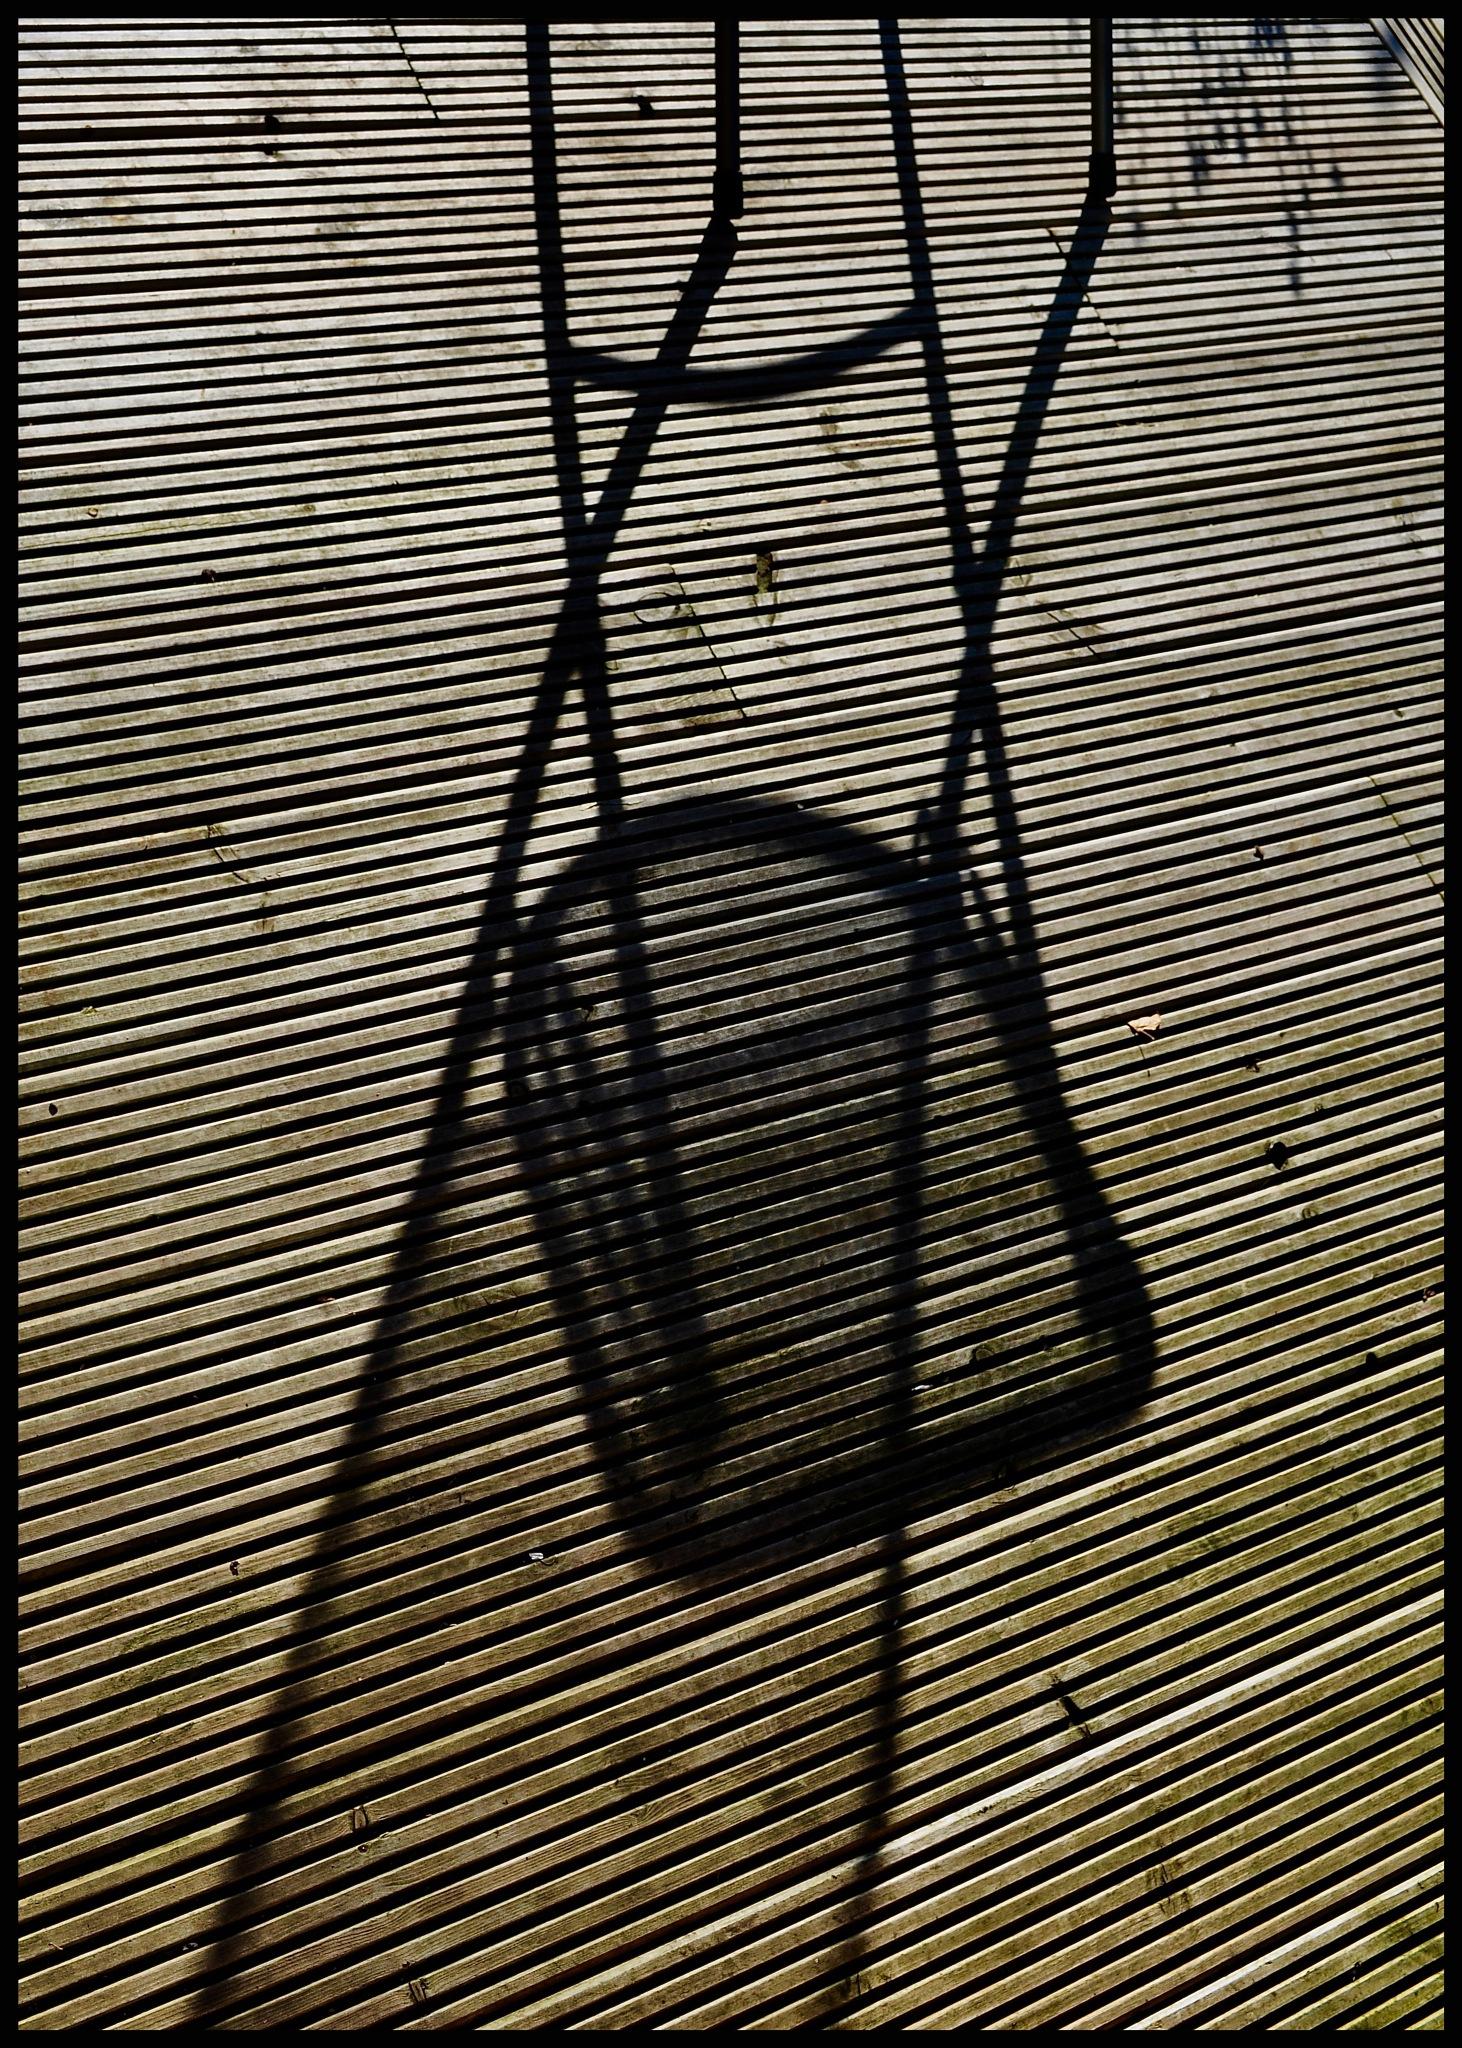 Folding Chair by warriston